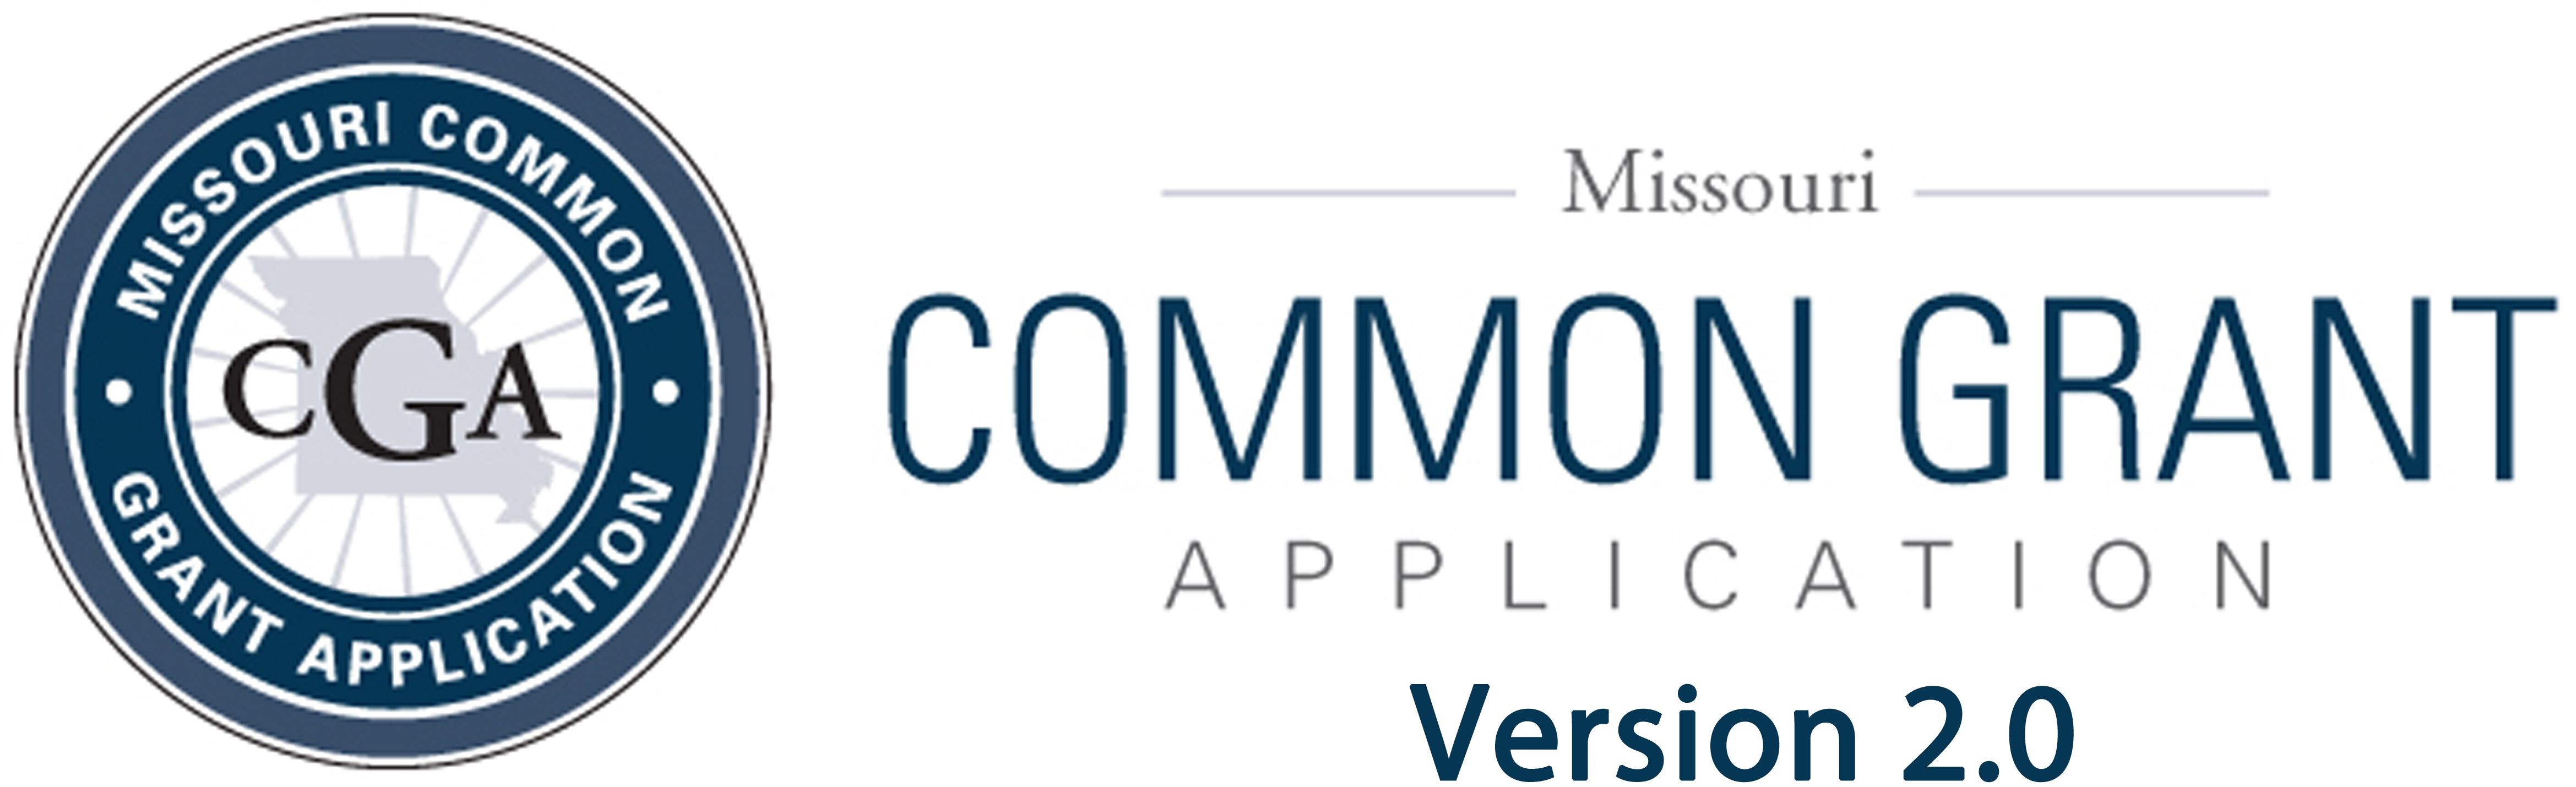 Missouri Common Grant Application Logo